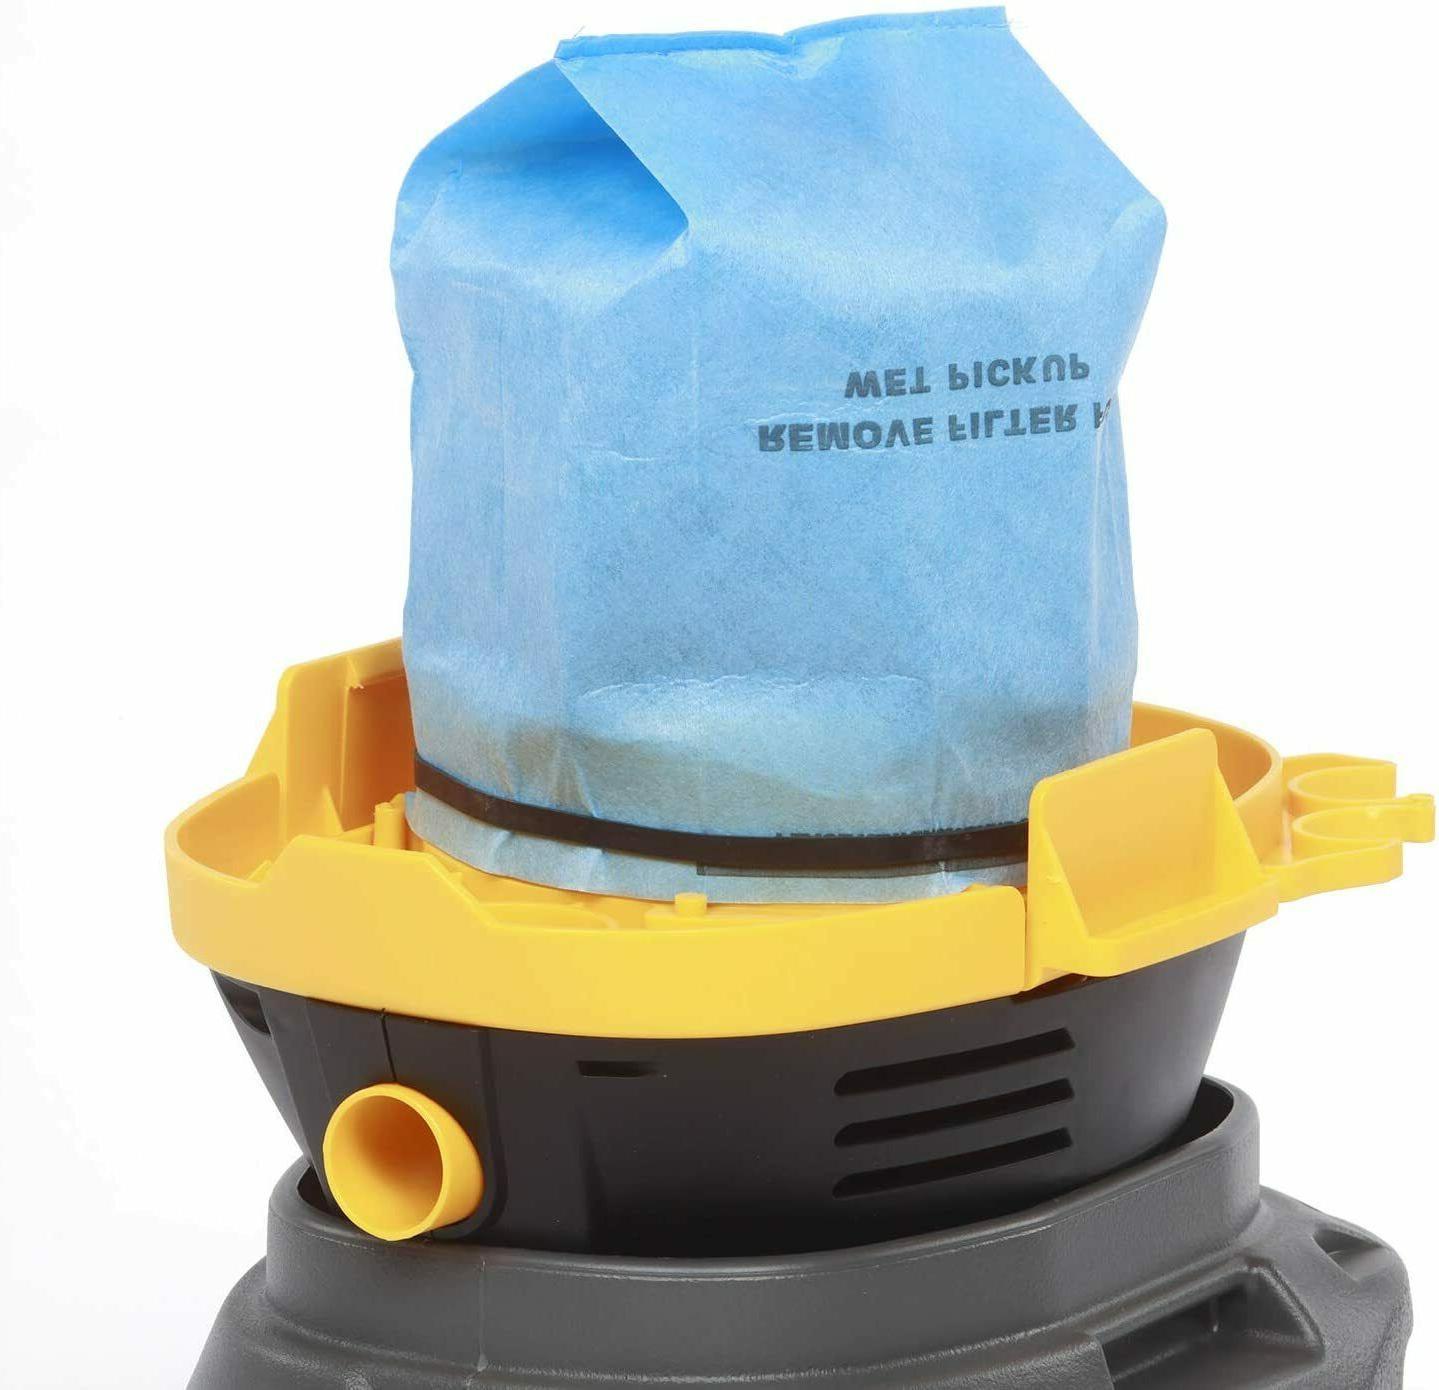 6 Vacuum Bag Filters 2.5 - Vac Wet Dry Bags